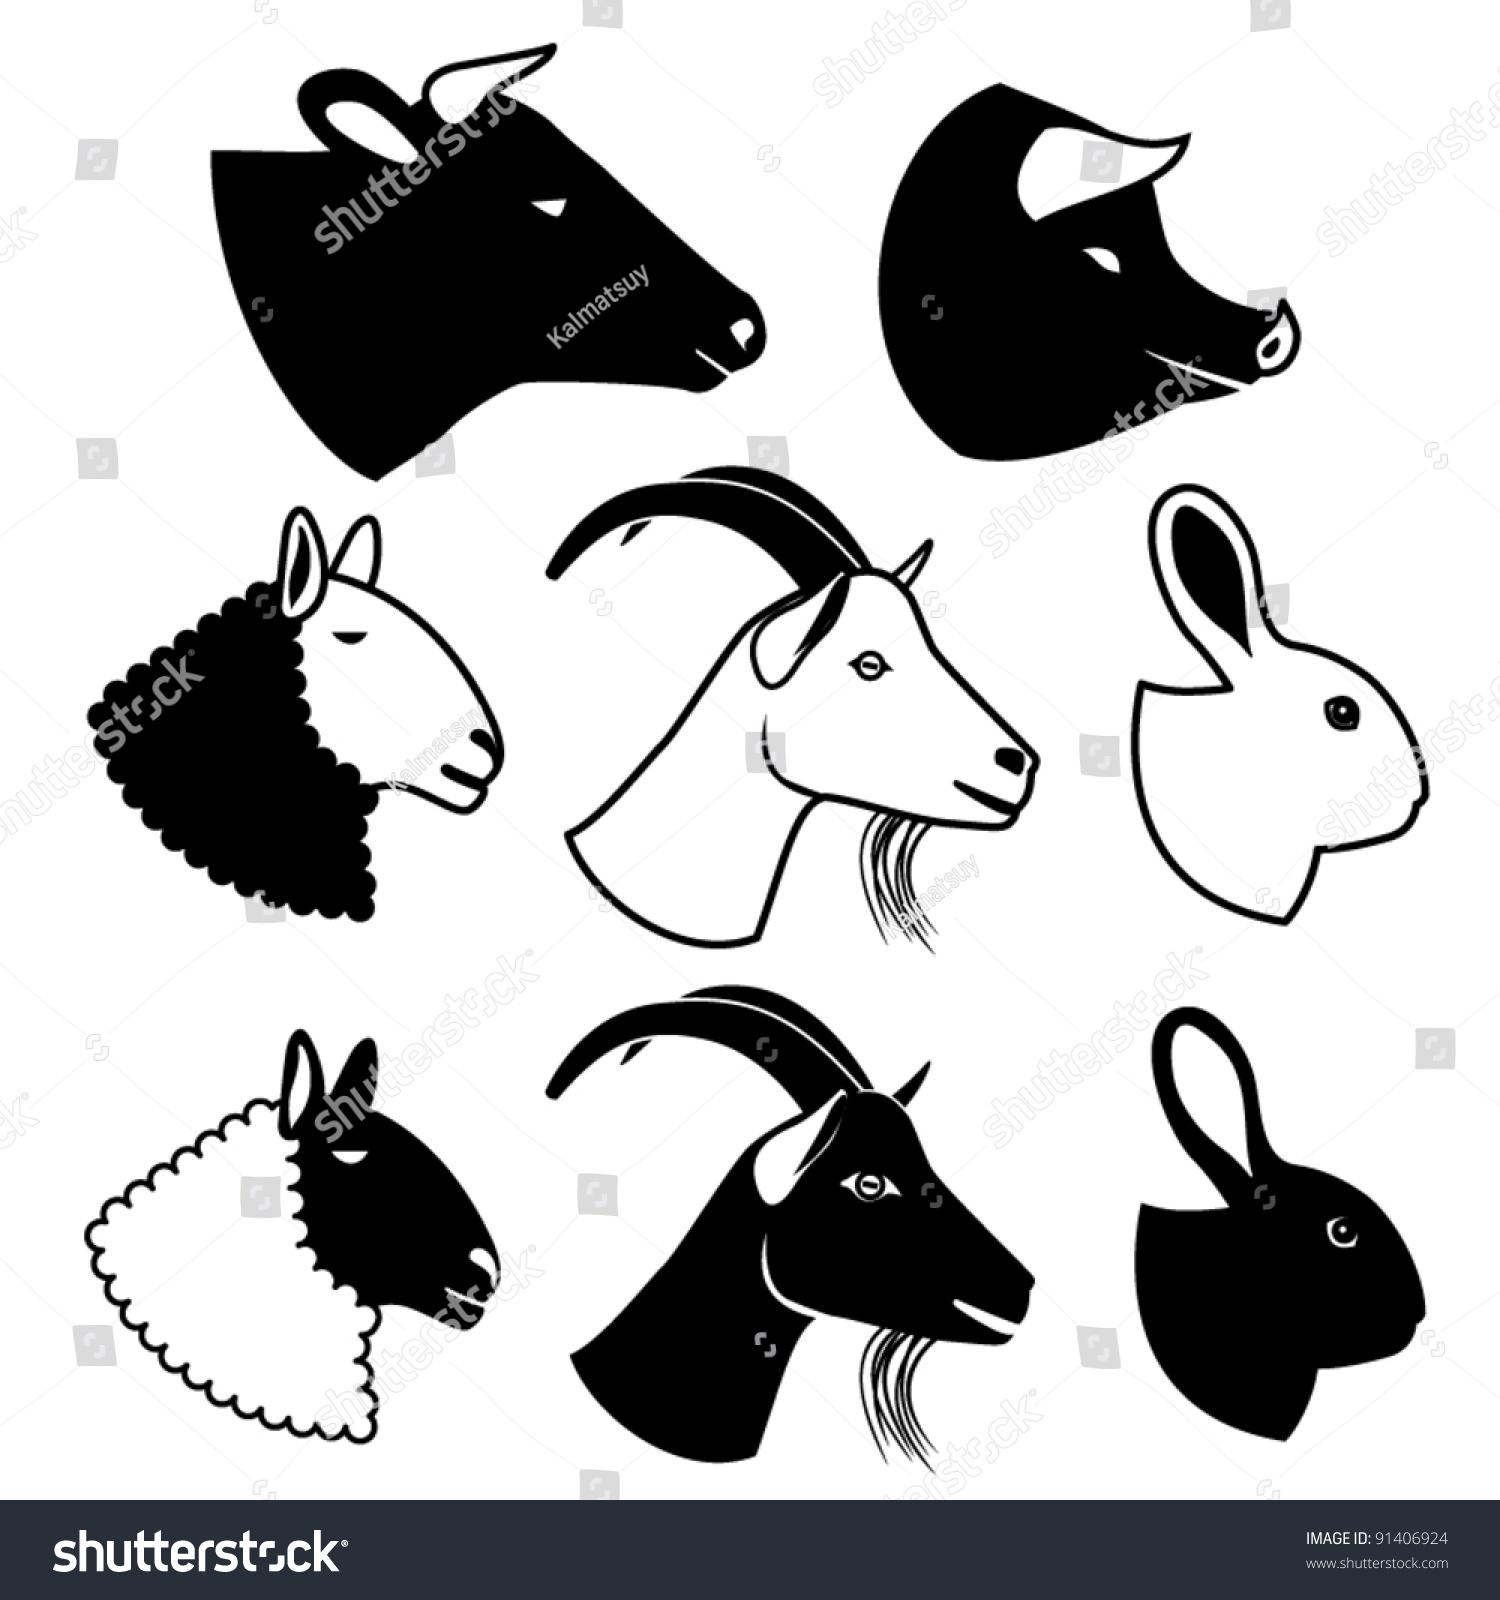 Farm animal head silhouettes - photo#10